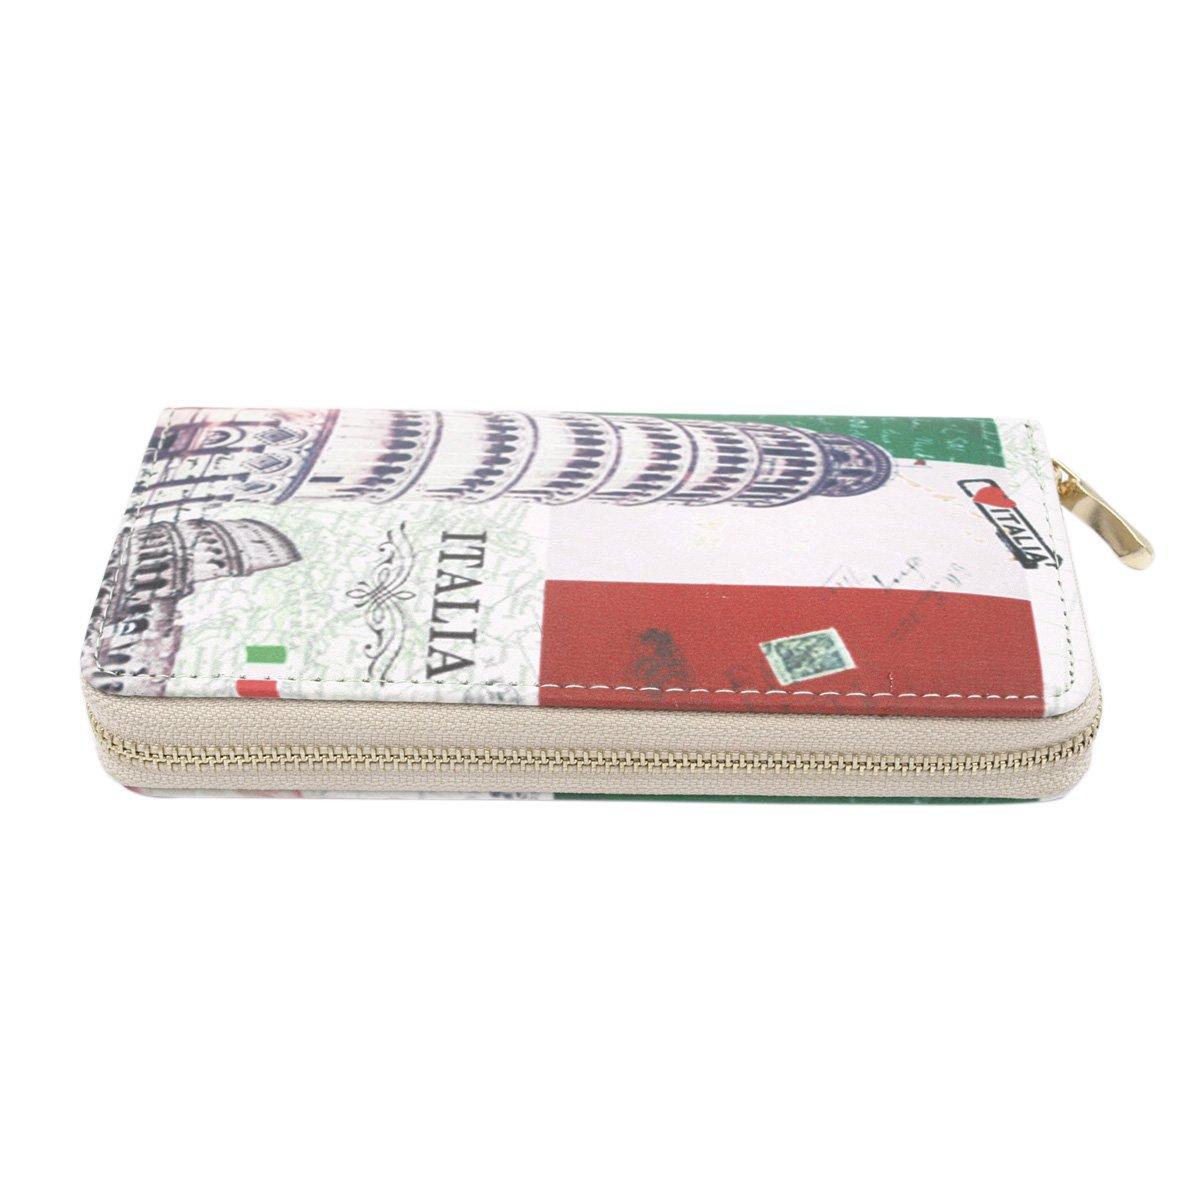 Premium Italy Flag Pisa Tower City Landmark Print PU Leather Zip Around Wallet